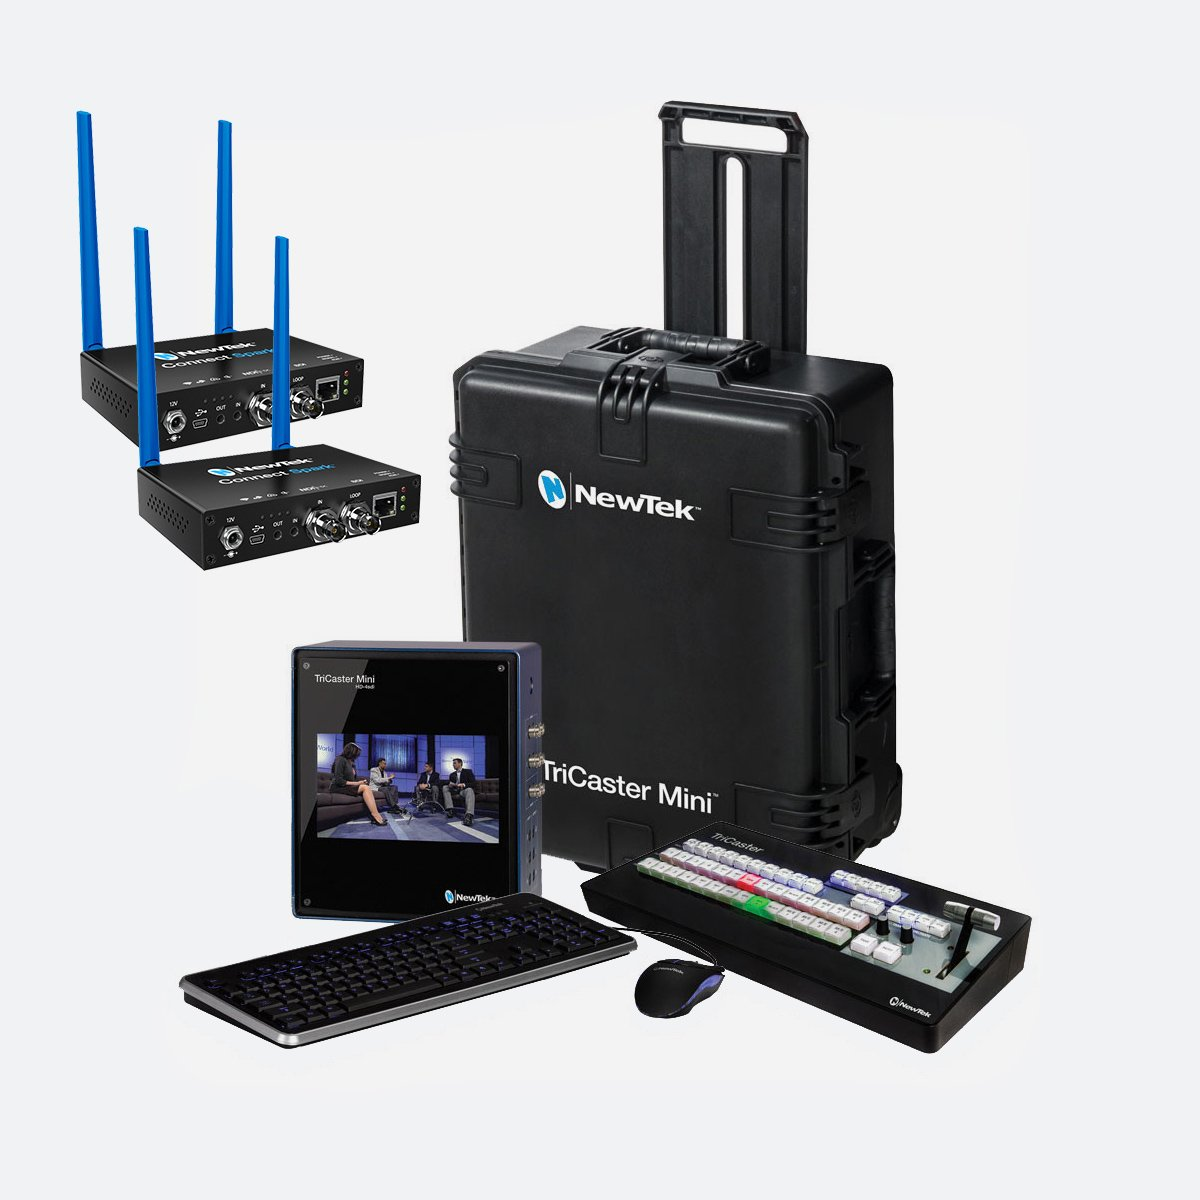 NewTek TriCaster Mini HD-4sdi SDI Bundle Spark SDI